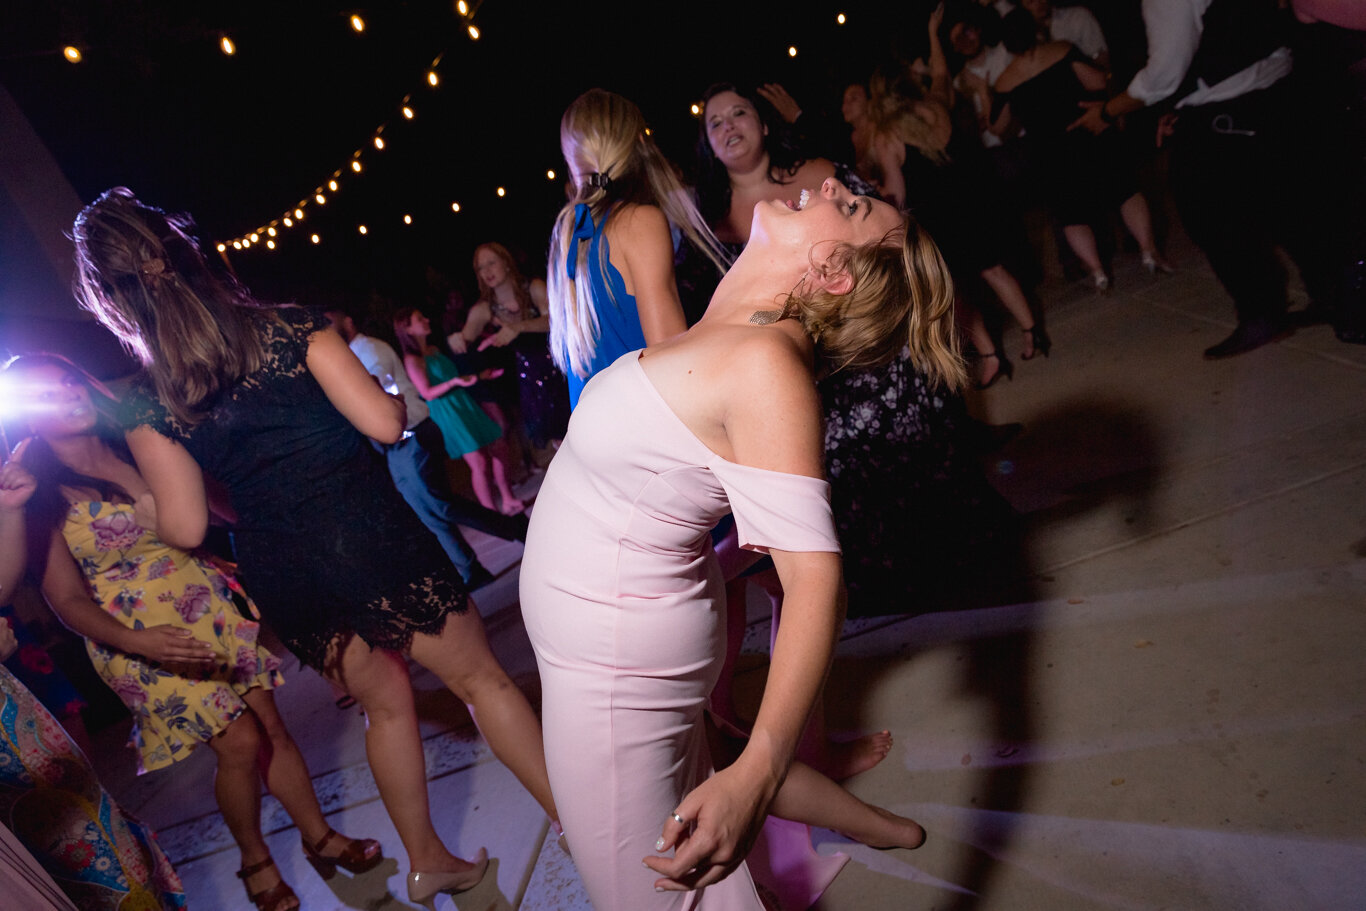 2019.08.24_Emily-Ashir-Wedding-at-the-Maples-6620.jpg